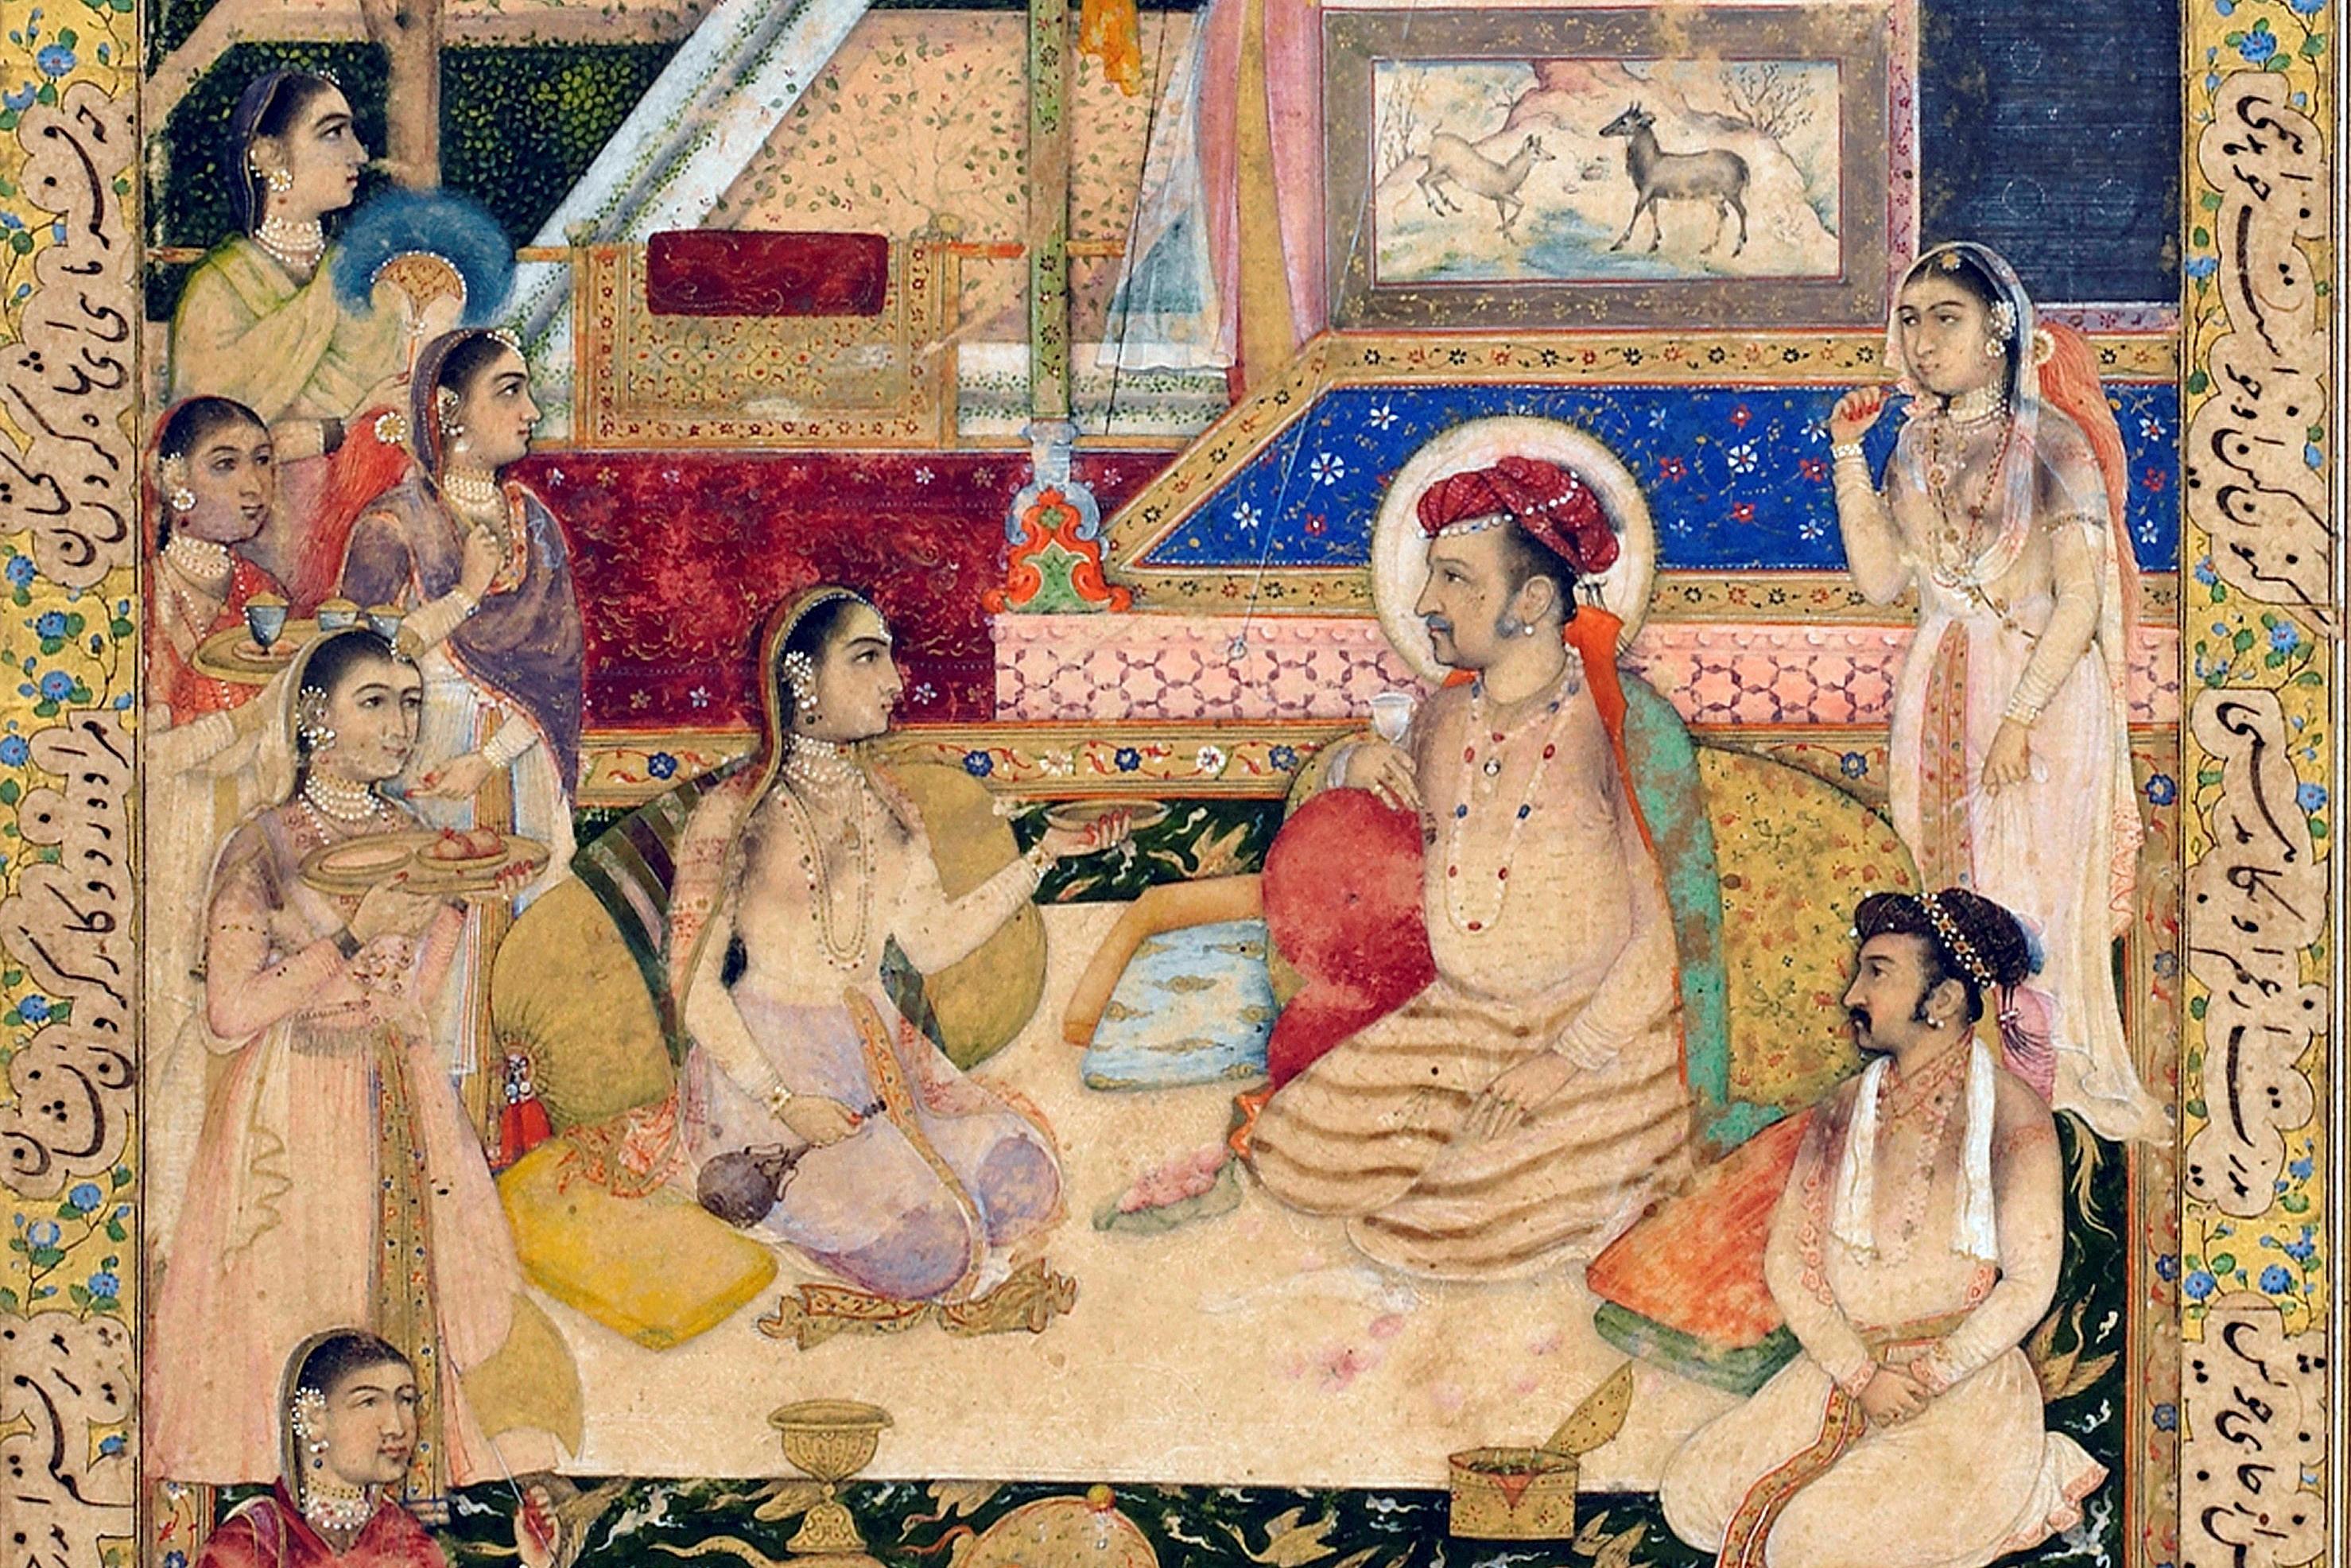 Nur Jahan with Jahangir and Prince Khurram